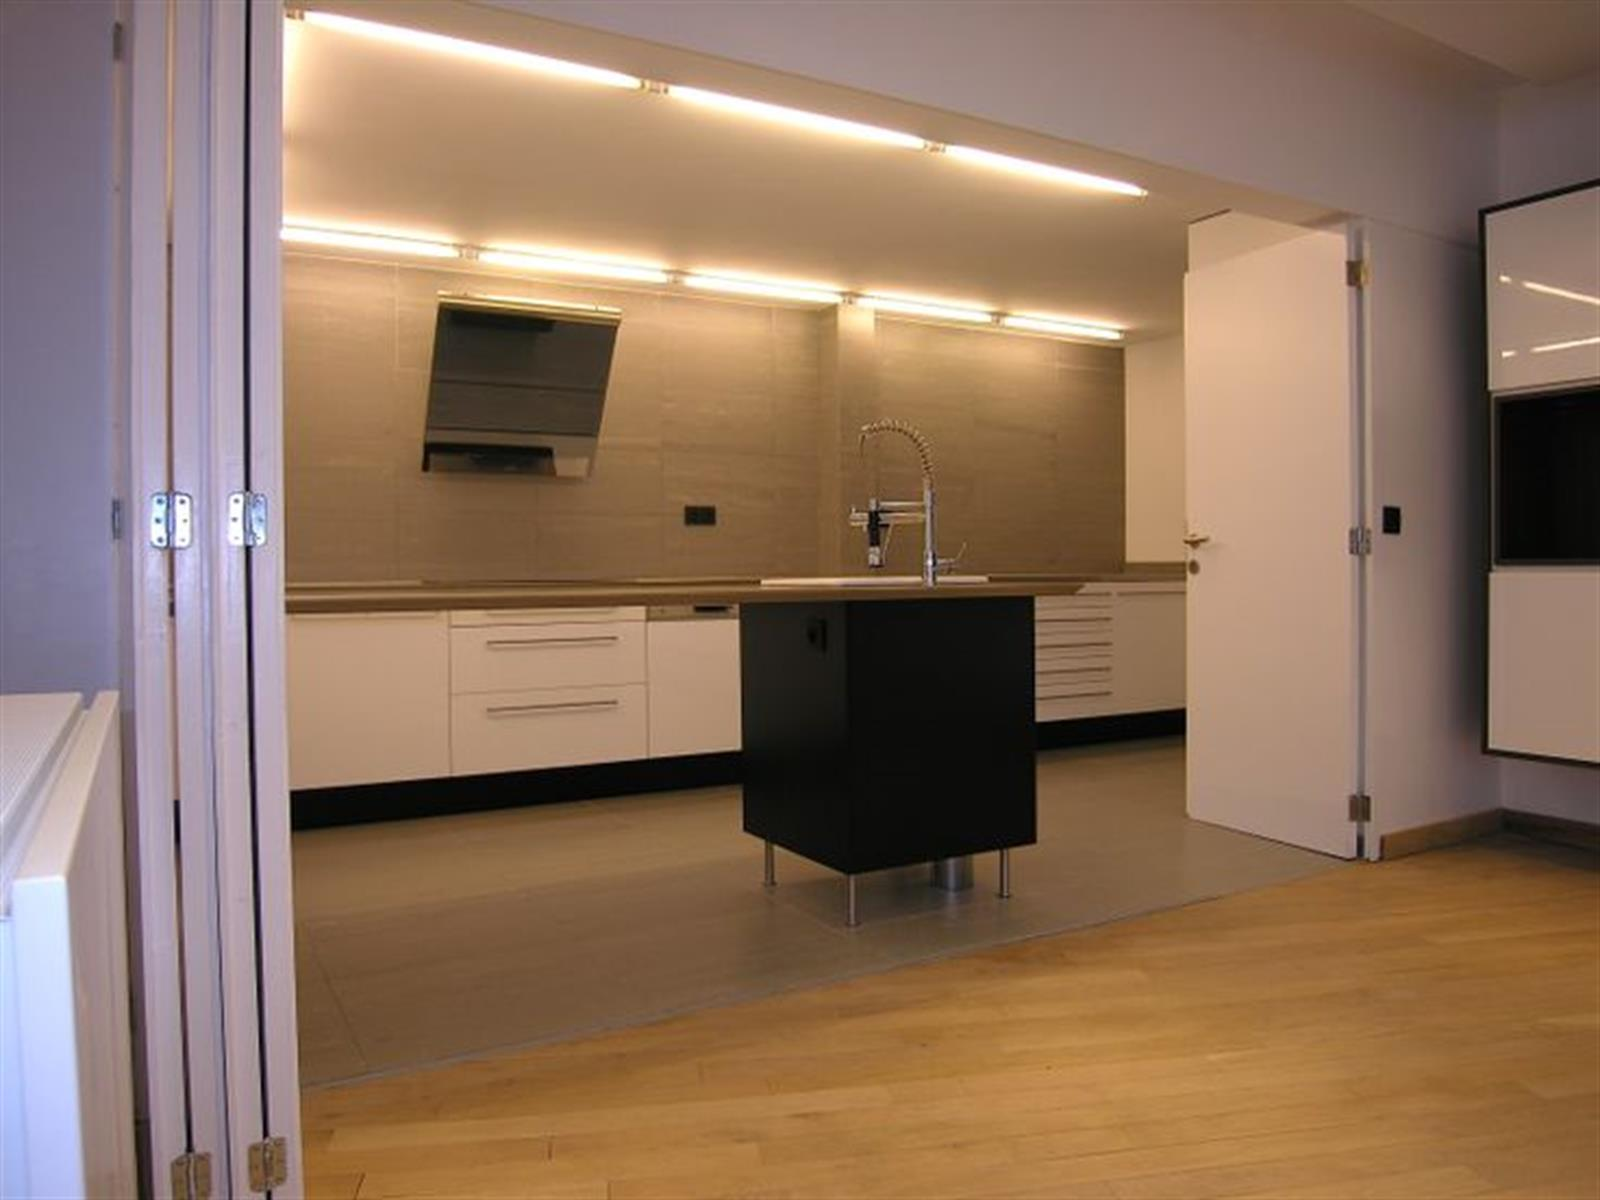 Loft - Etterbeek - #4448724-6